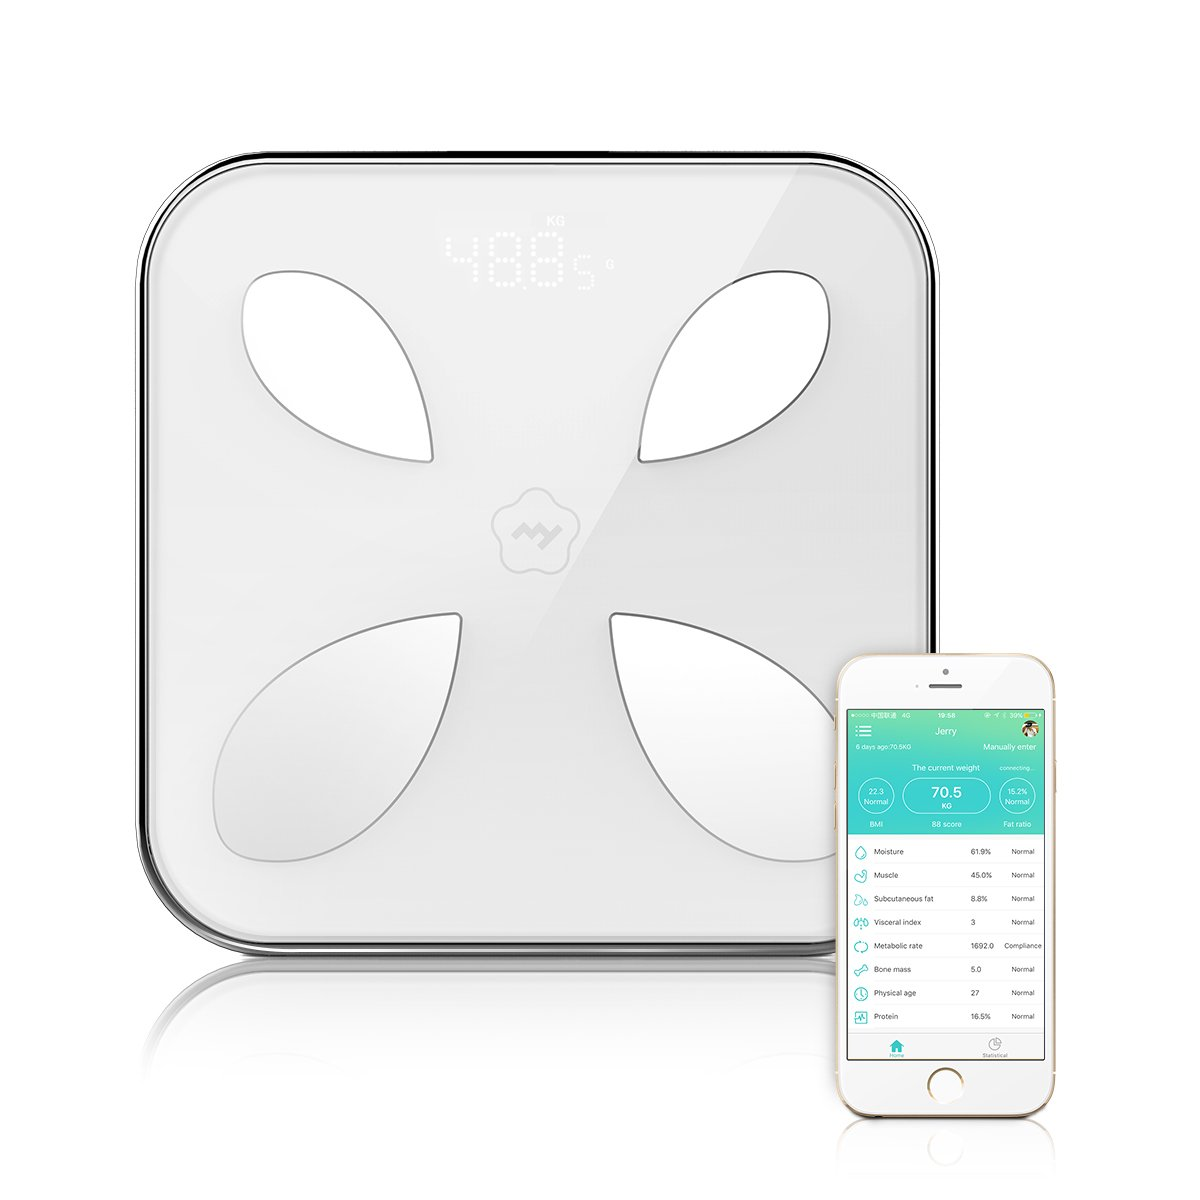 lemonda escala de grasa corporal Bluetooth Smart - Báscula inteligente báscula digital analizador de grasa corporal de baño con el smartphone App Inglés: ...